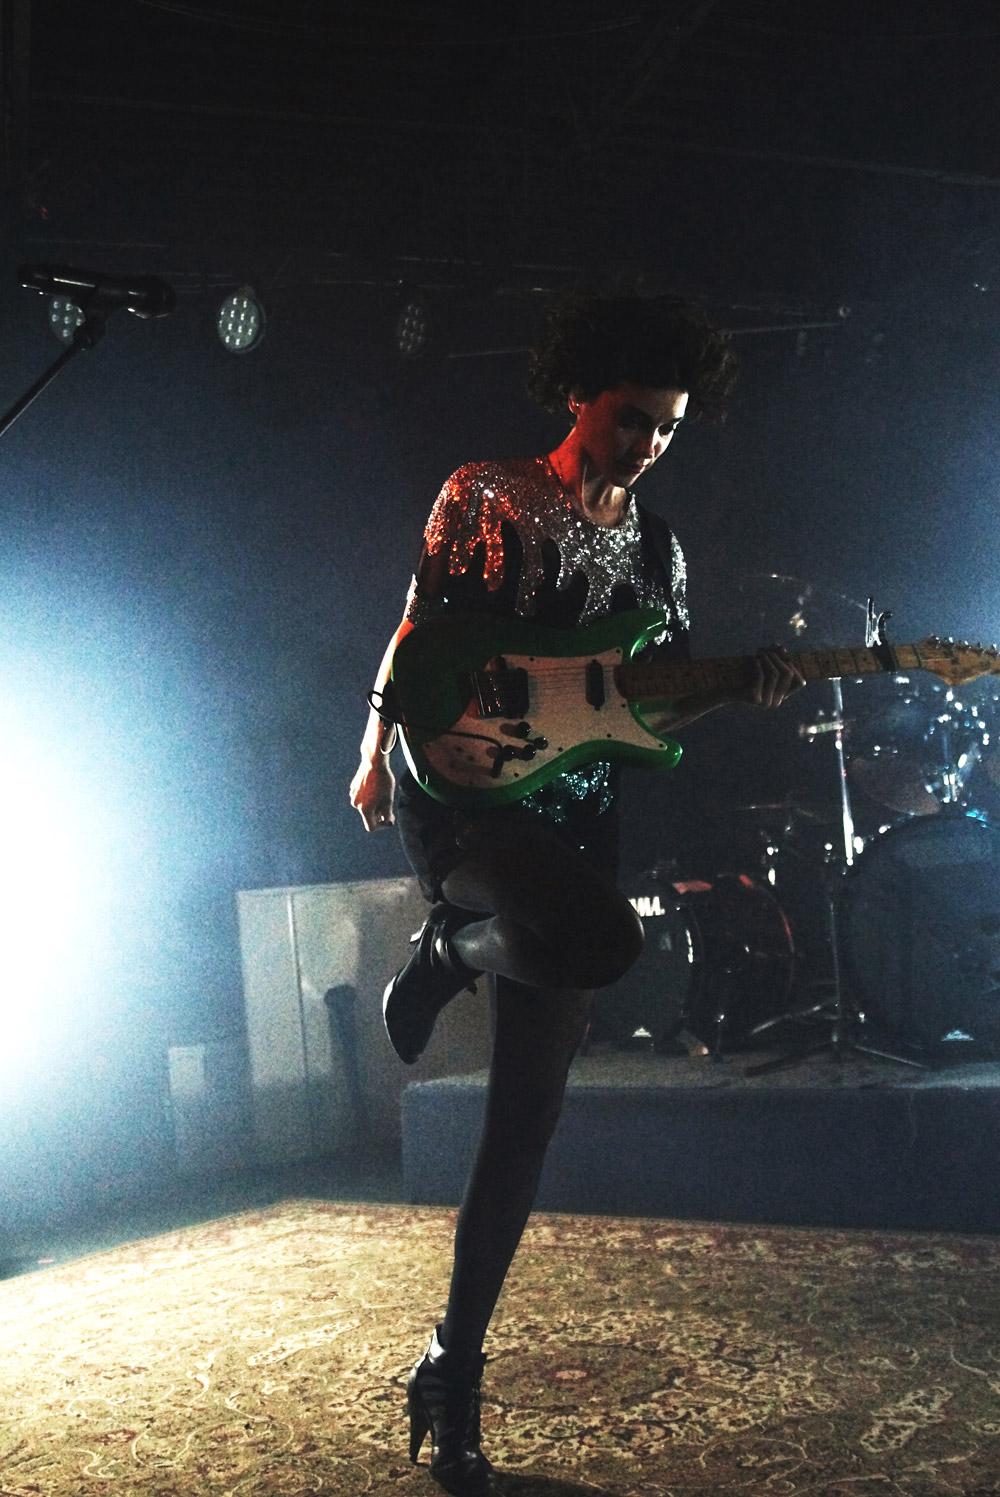 Upstate Concerts New York - m.facebook.com